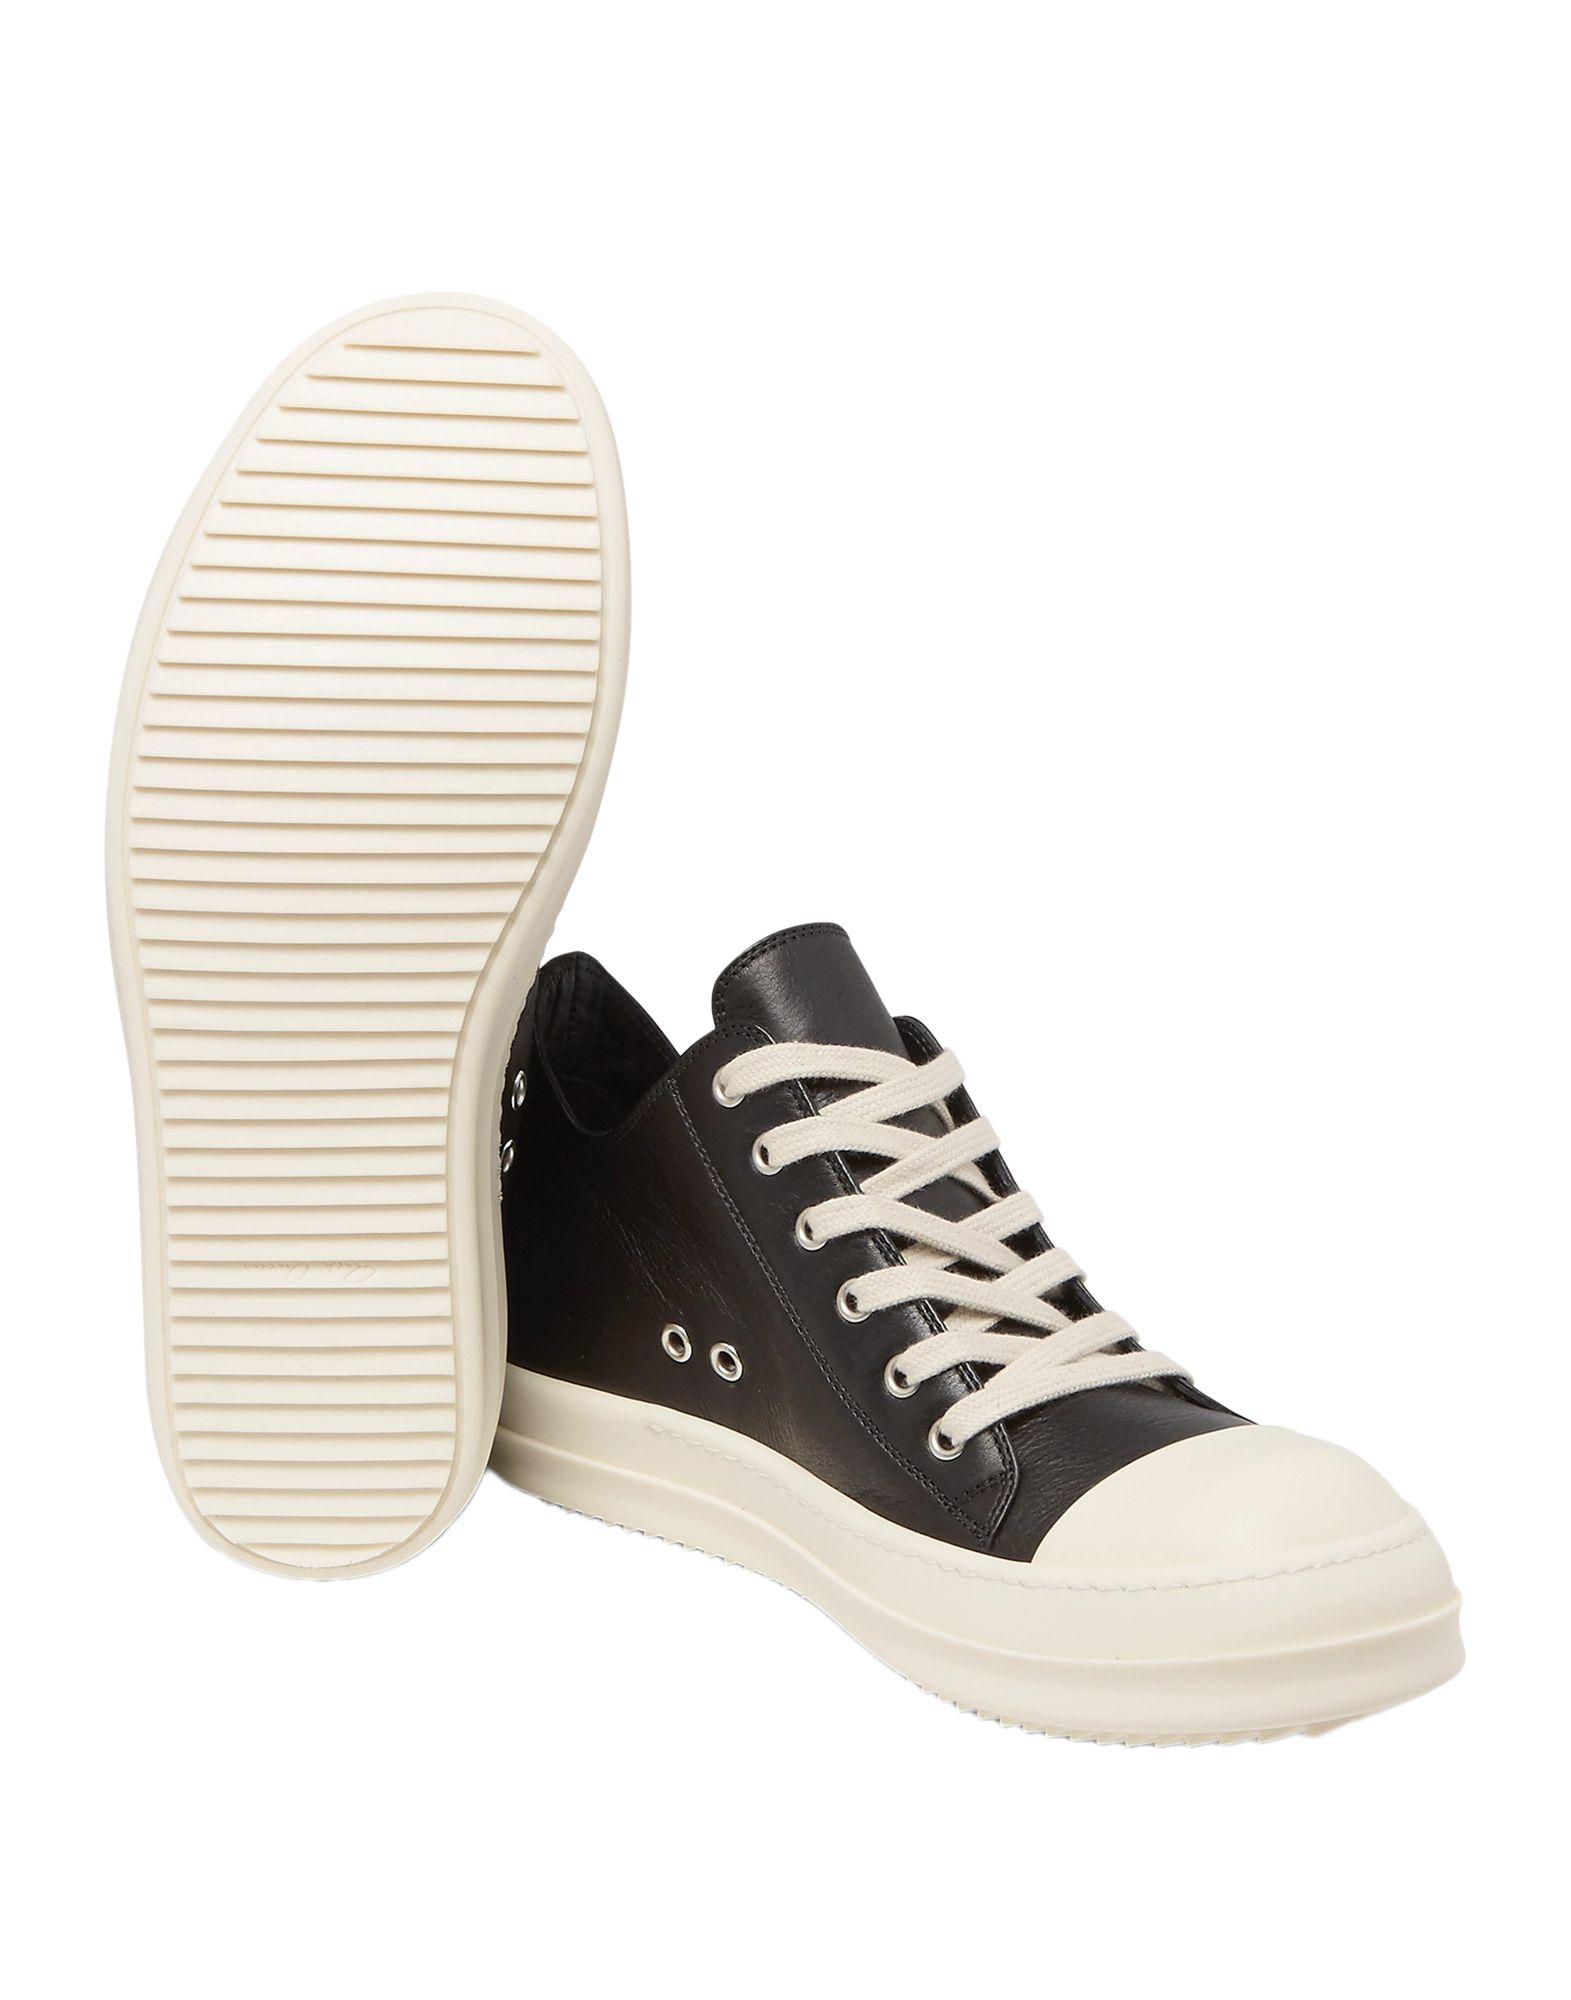 Drkshdw By Rick Rick Rick Owens Sneakers - Men Drkshdw By Rick Owens Sneakers online on  Canada - 11452538MJ e79bb6